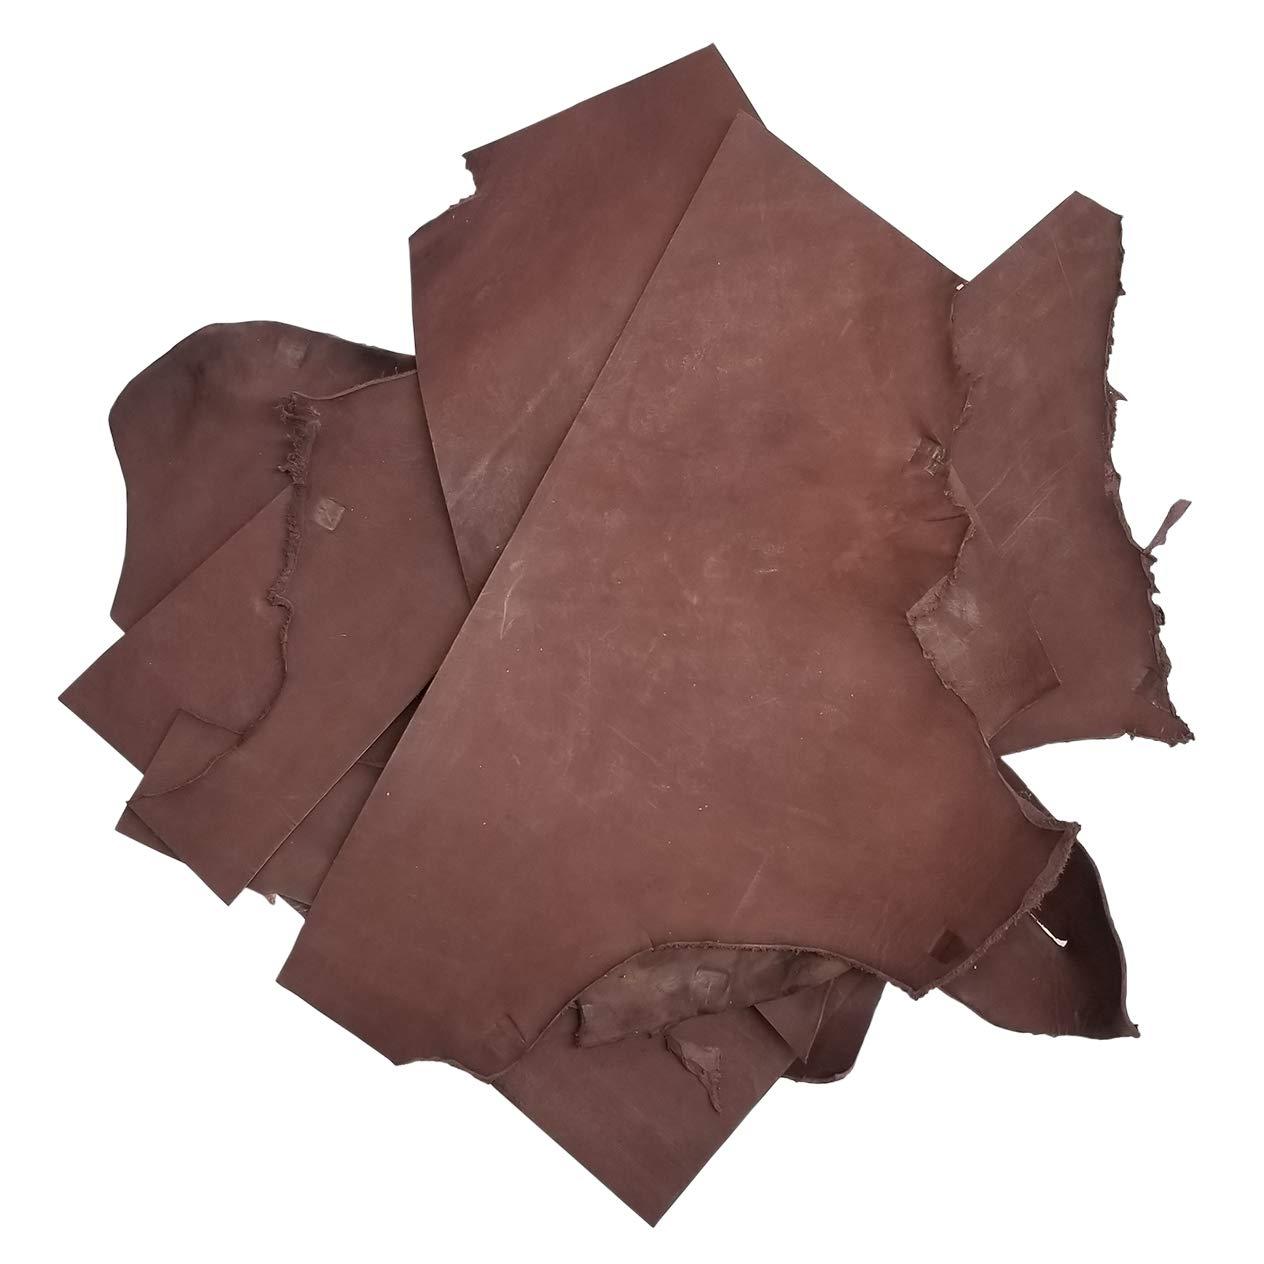 Holster & Sheath Leather - 5 Pound Scrap Bag Wickett & Craig